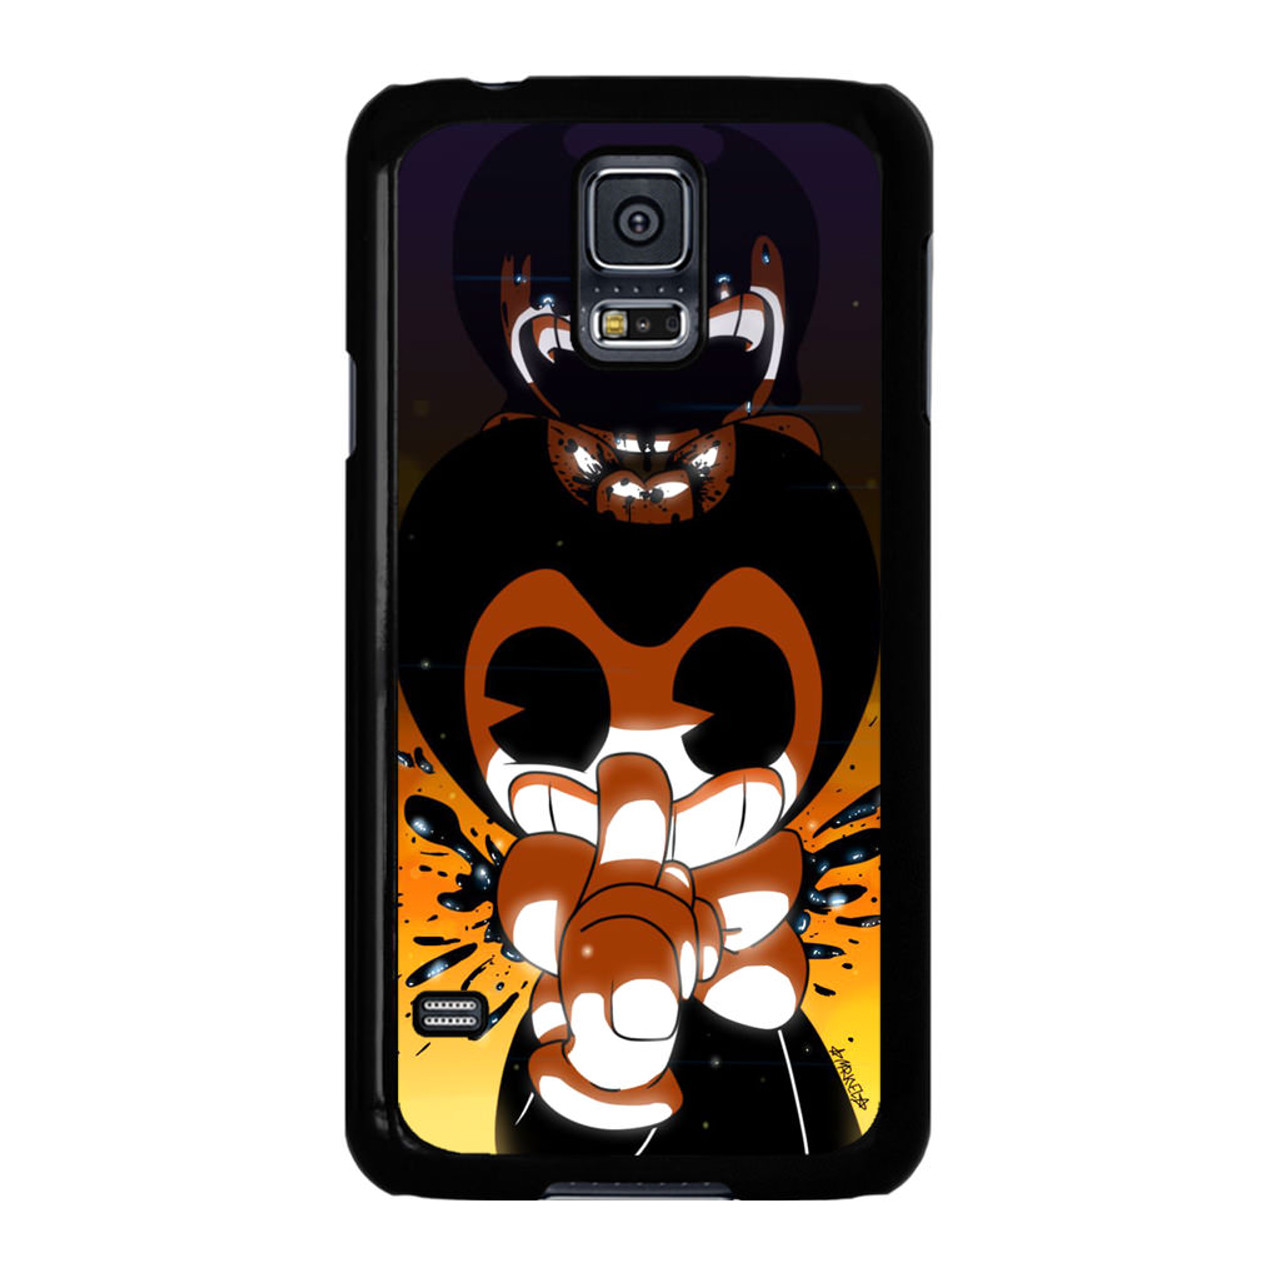 Look - Samsung stylish galaxy s5 cases video